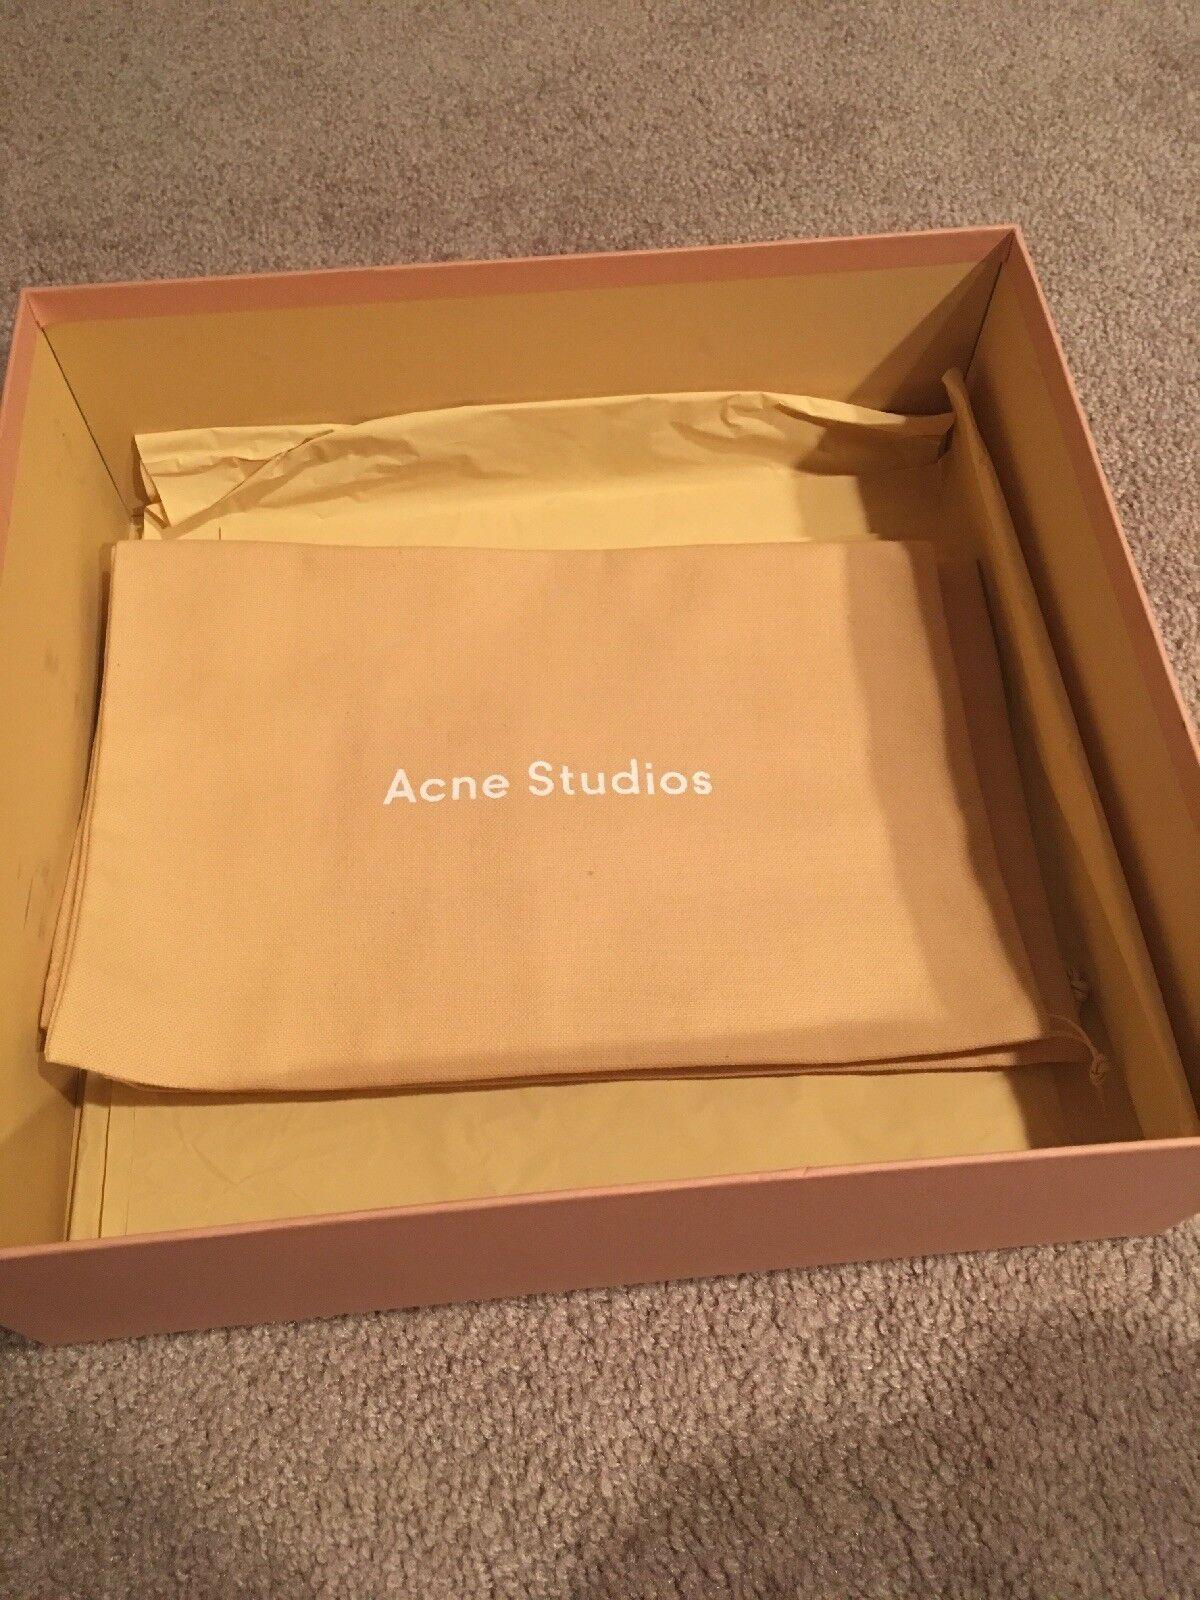 Acne Studios Althea Boots Boots Boots 41 5e1e25